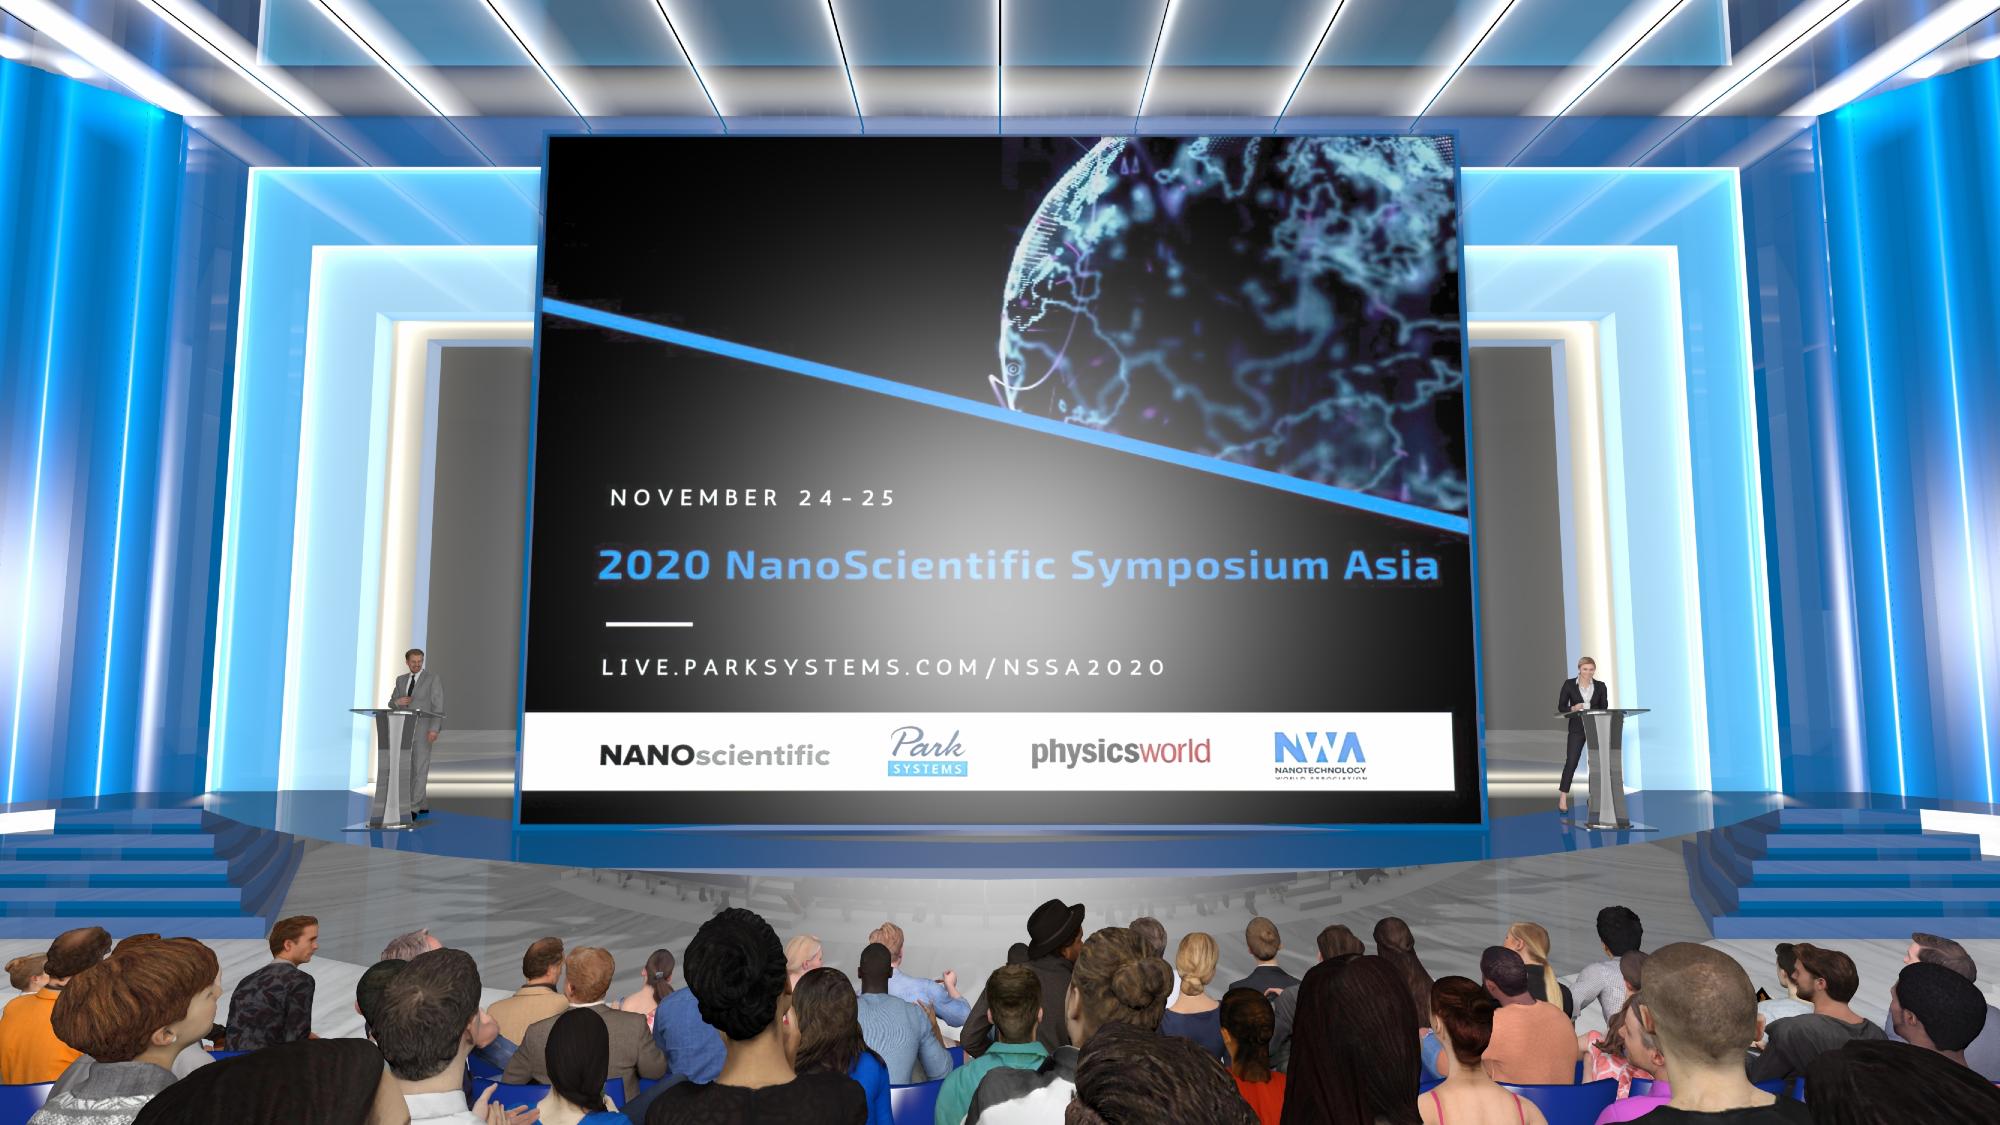 Park Systems объявляет о нано-научном симпозиуме в Азии